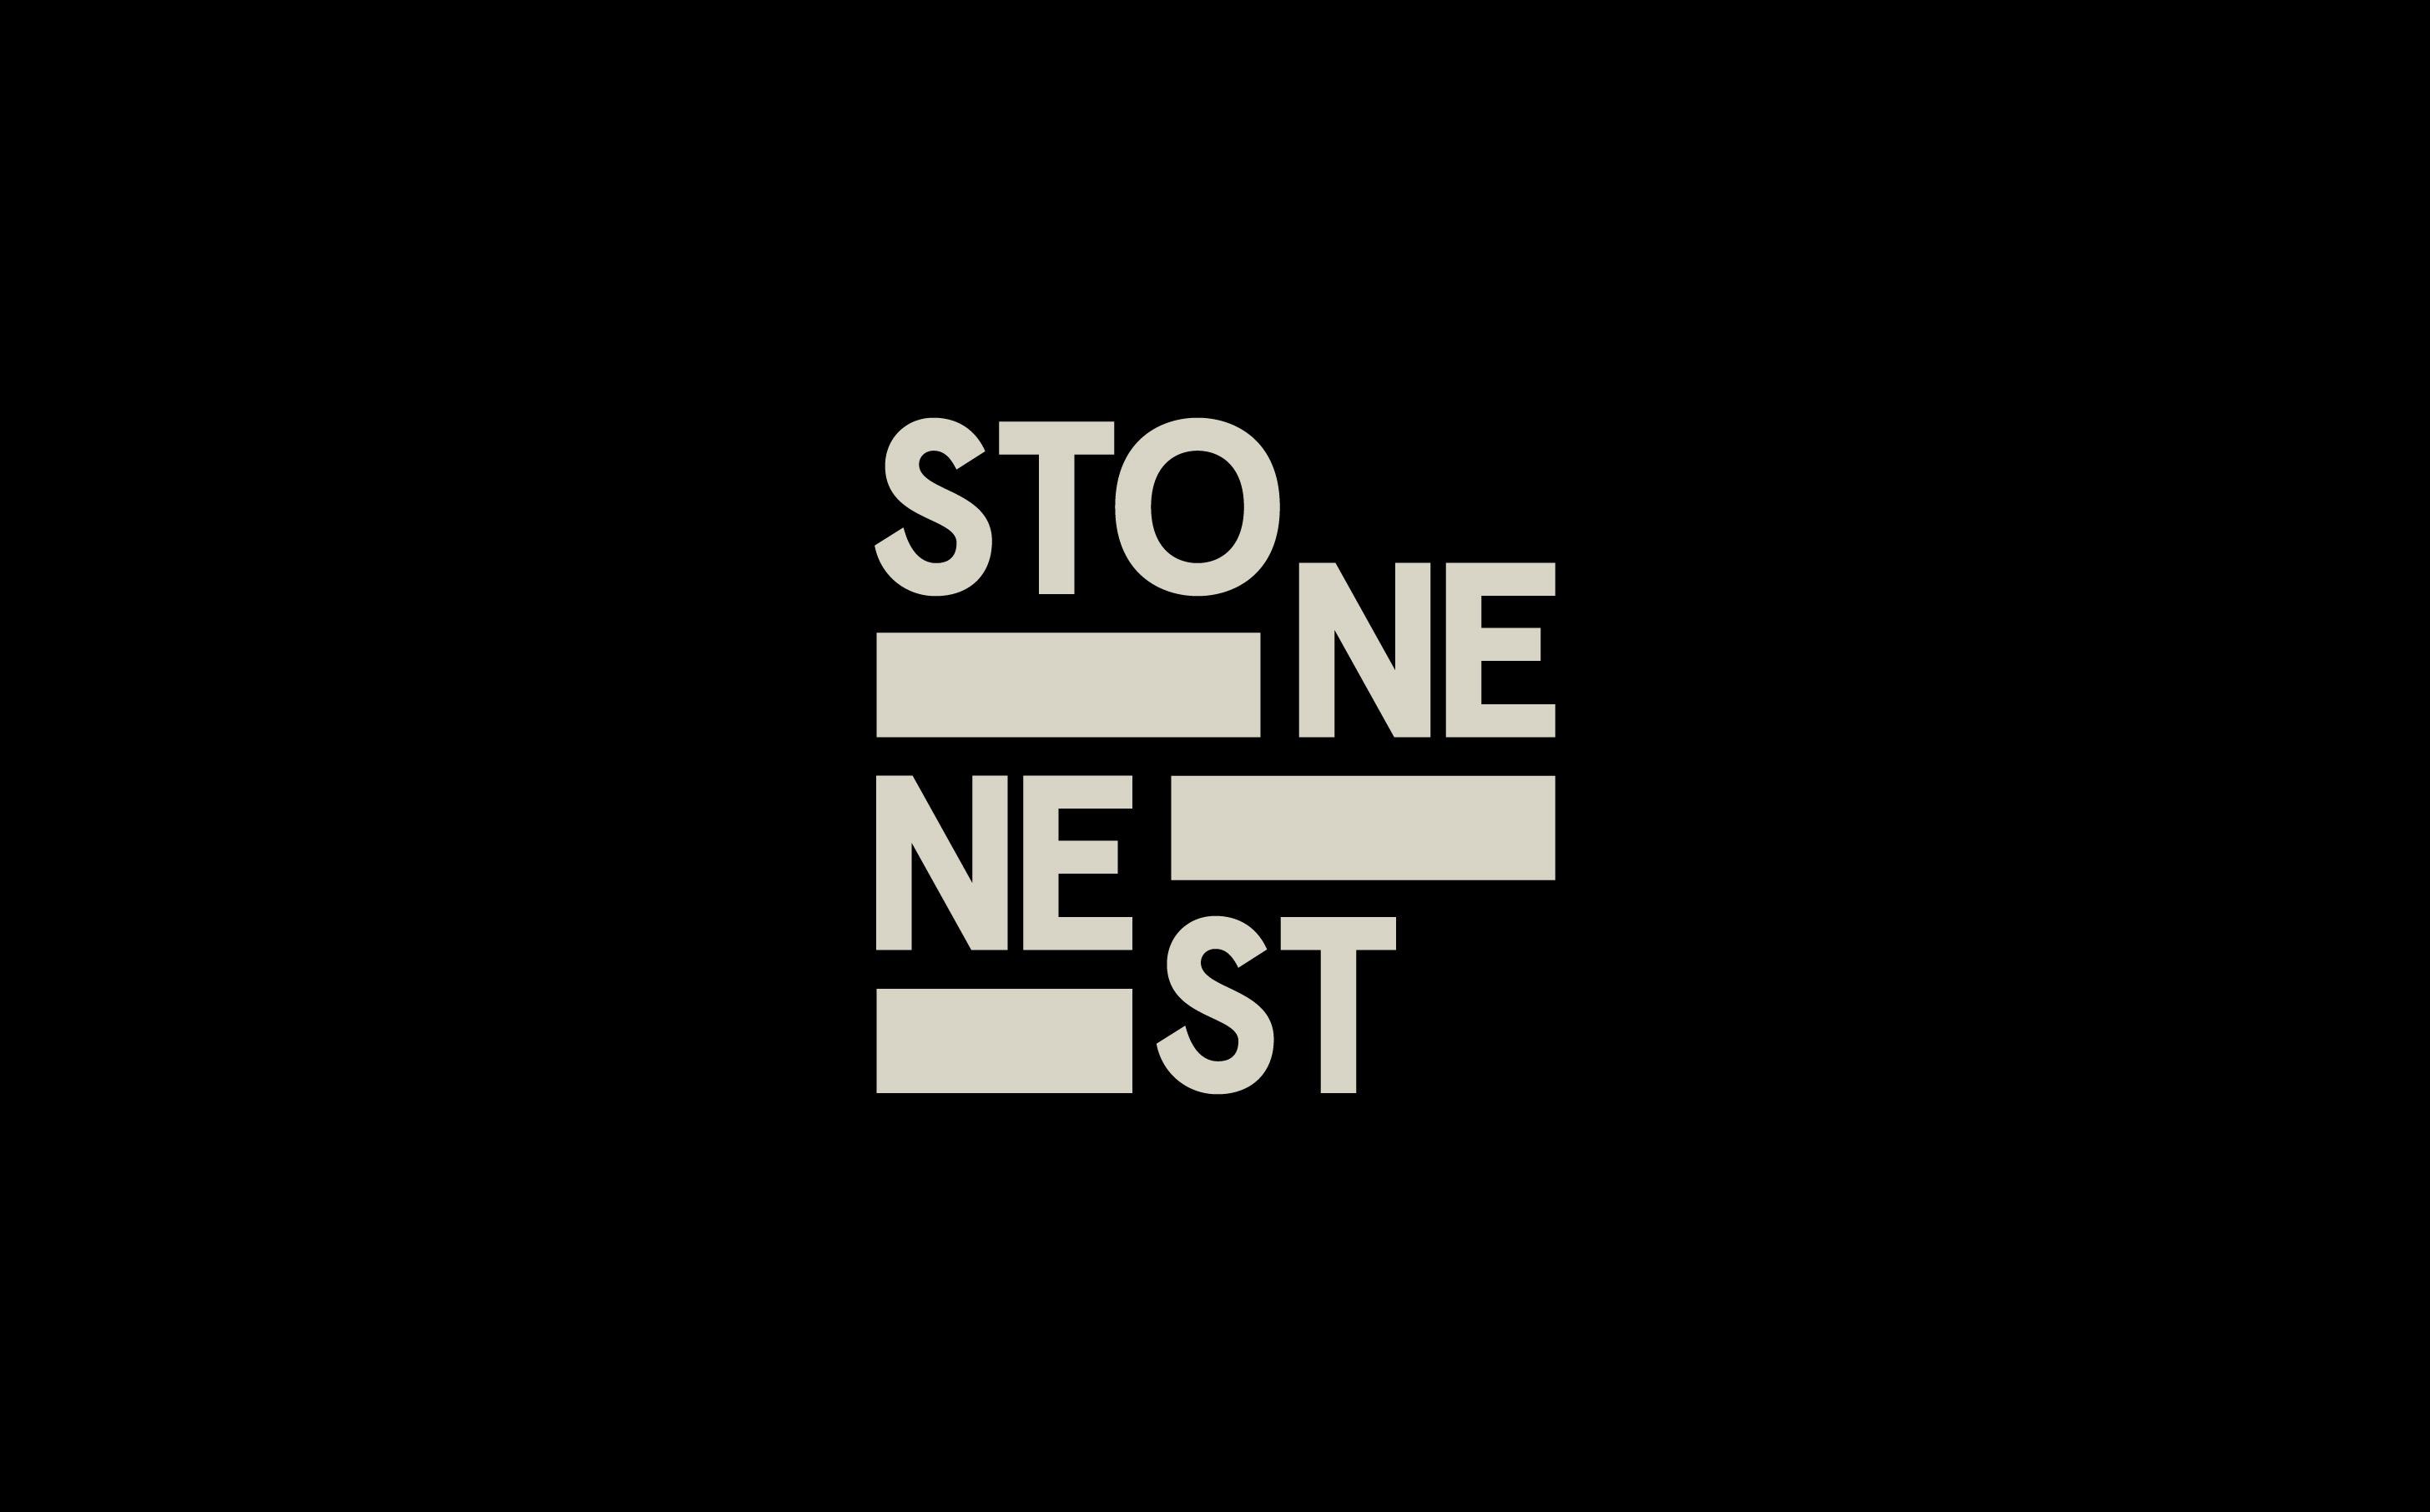 logo-design-stone-nest-2